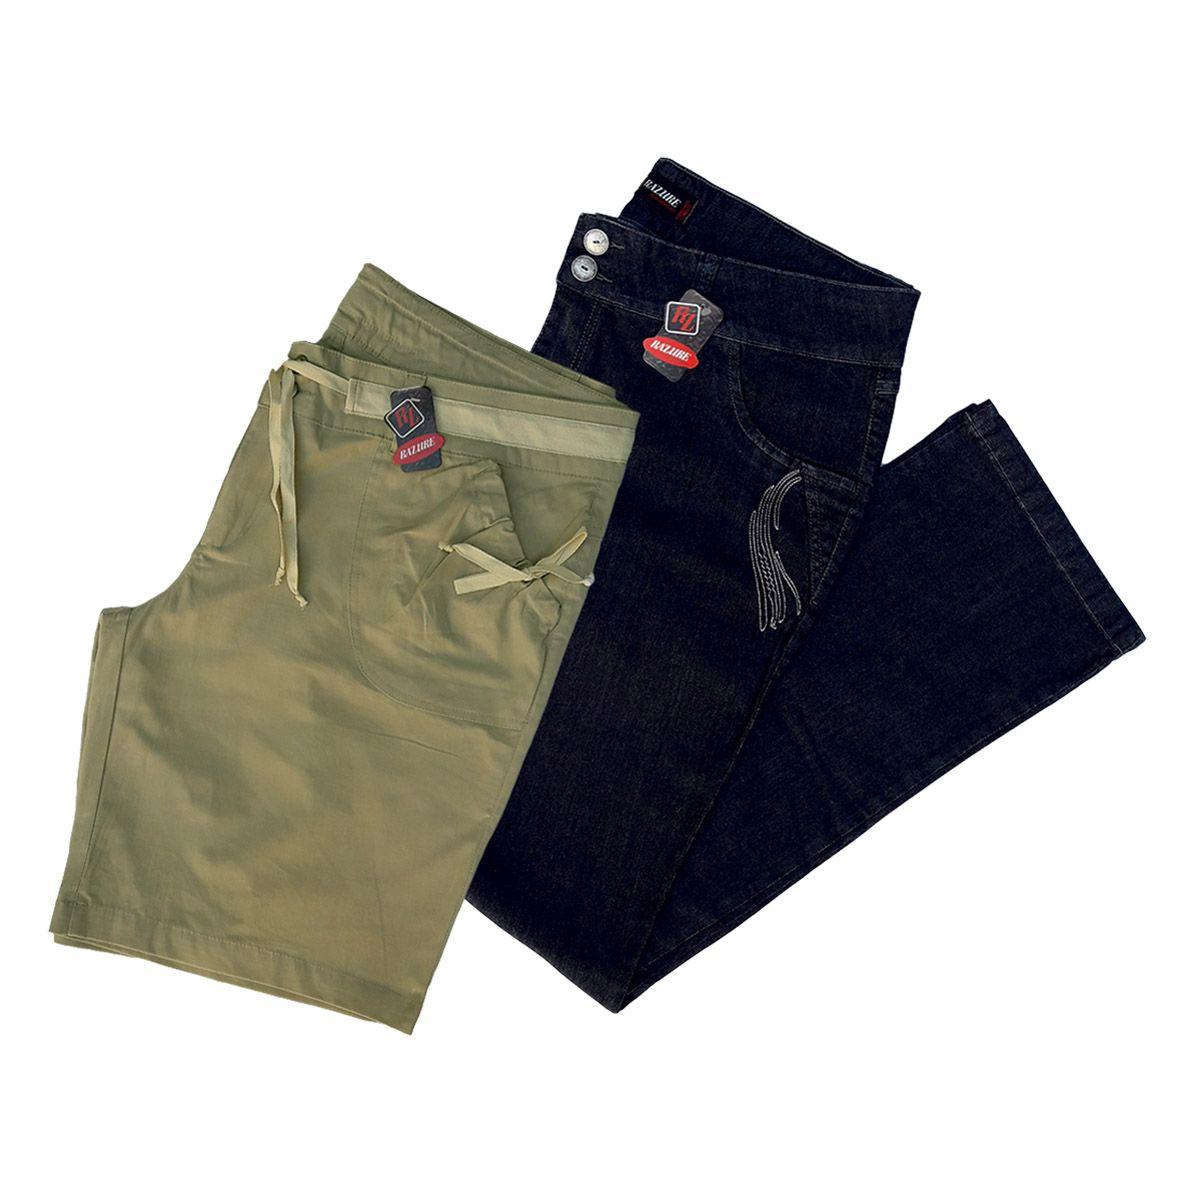 Kit 1 Calça E 1 Bermuda Femininas Cintura Alta Plus Size 56